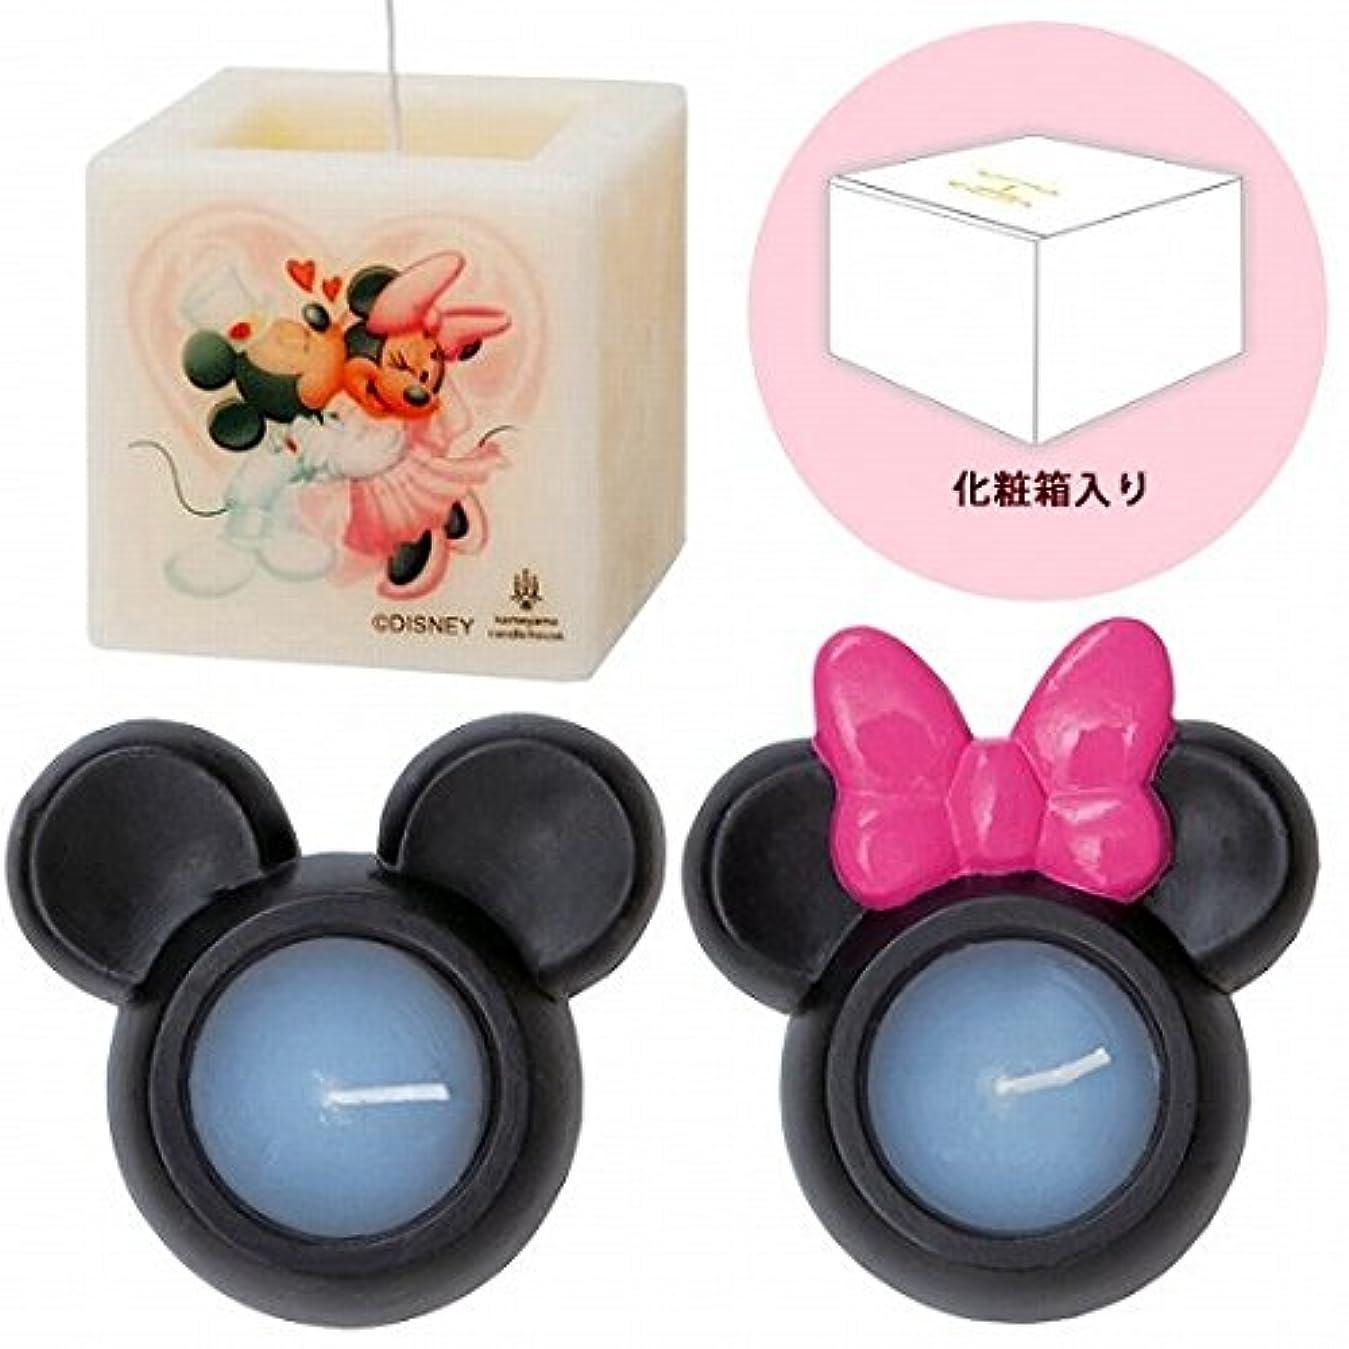 kameyama candle(カメヤマキャンドル) ミッキー&ミニーキャンドルセットM キャンドル 162x162x95mm (A7681002)